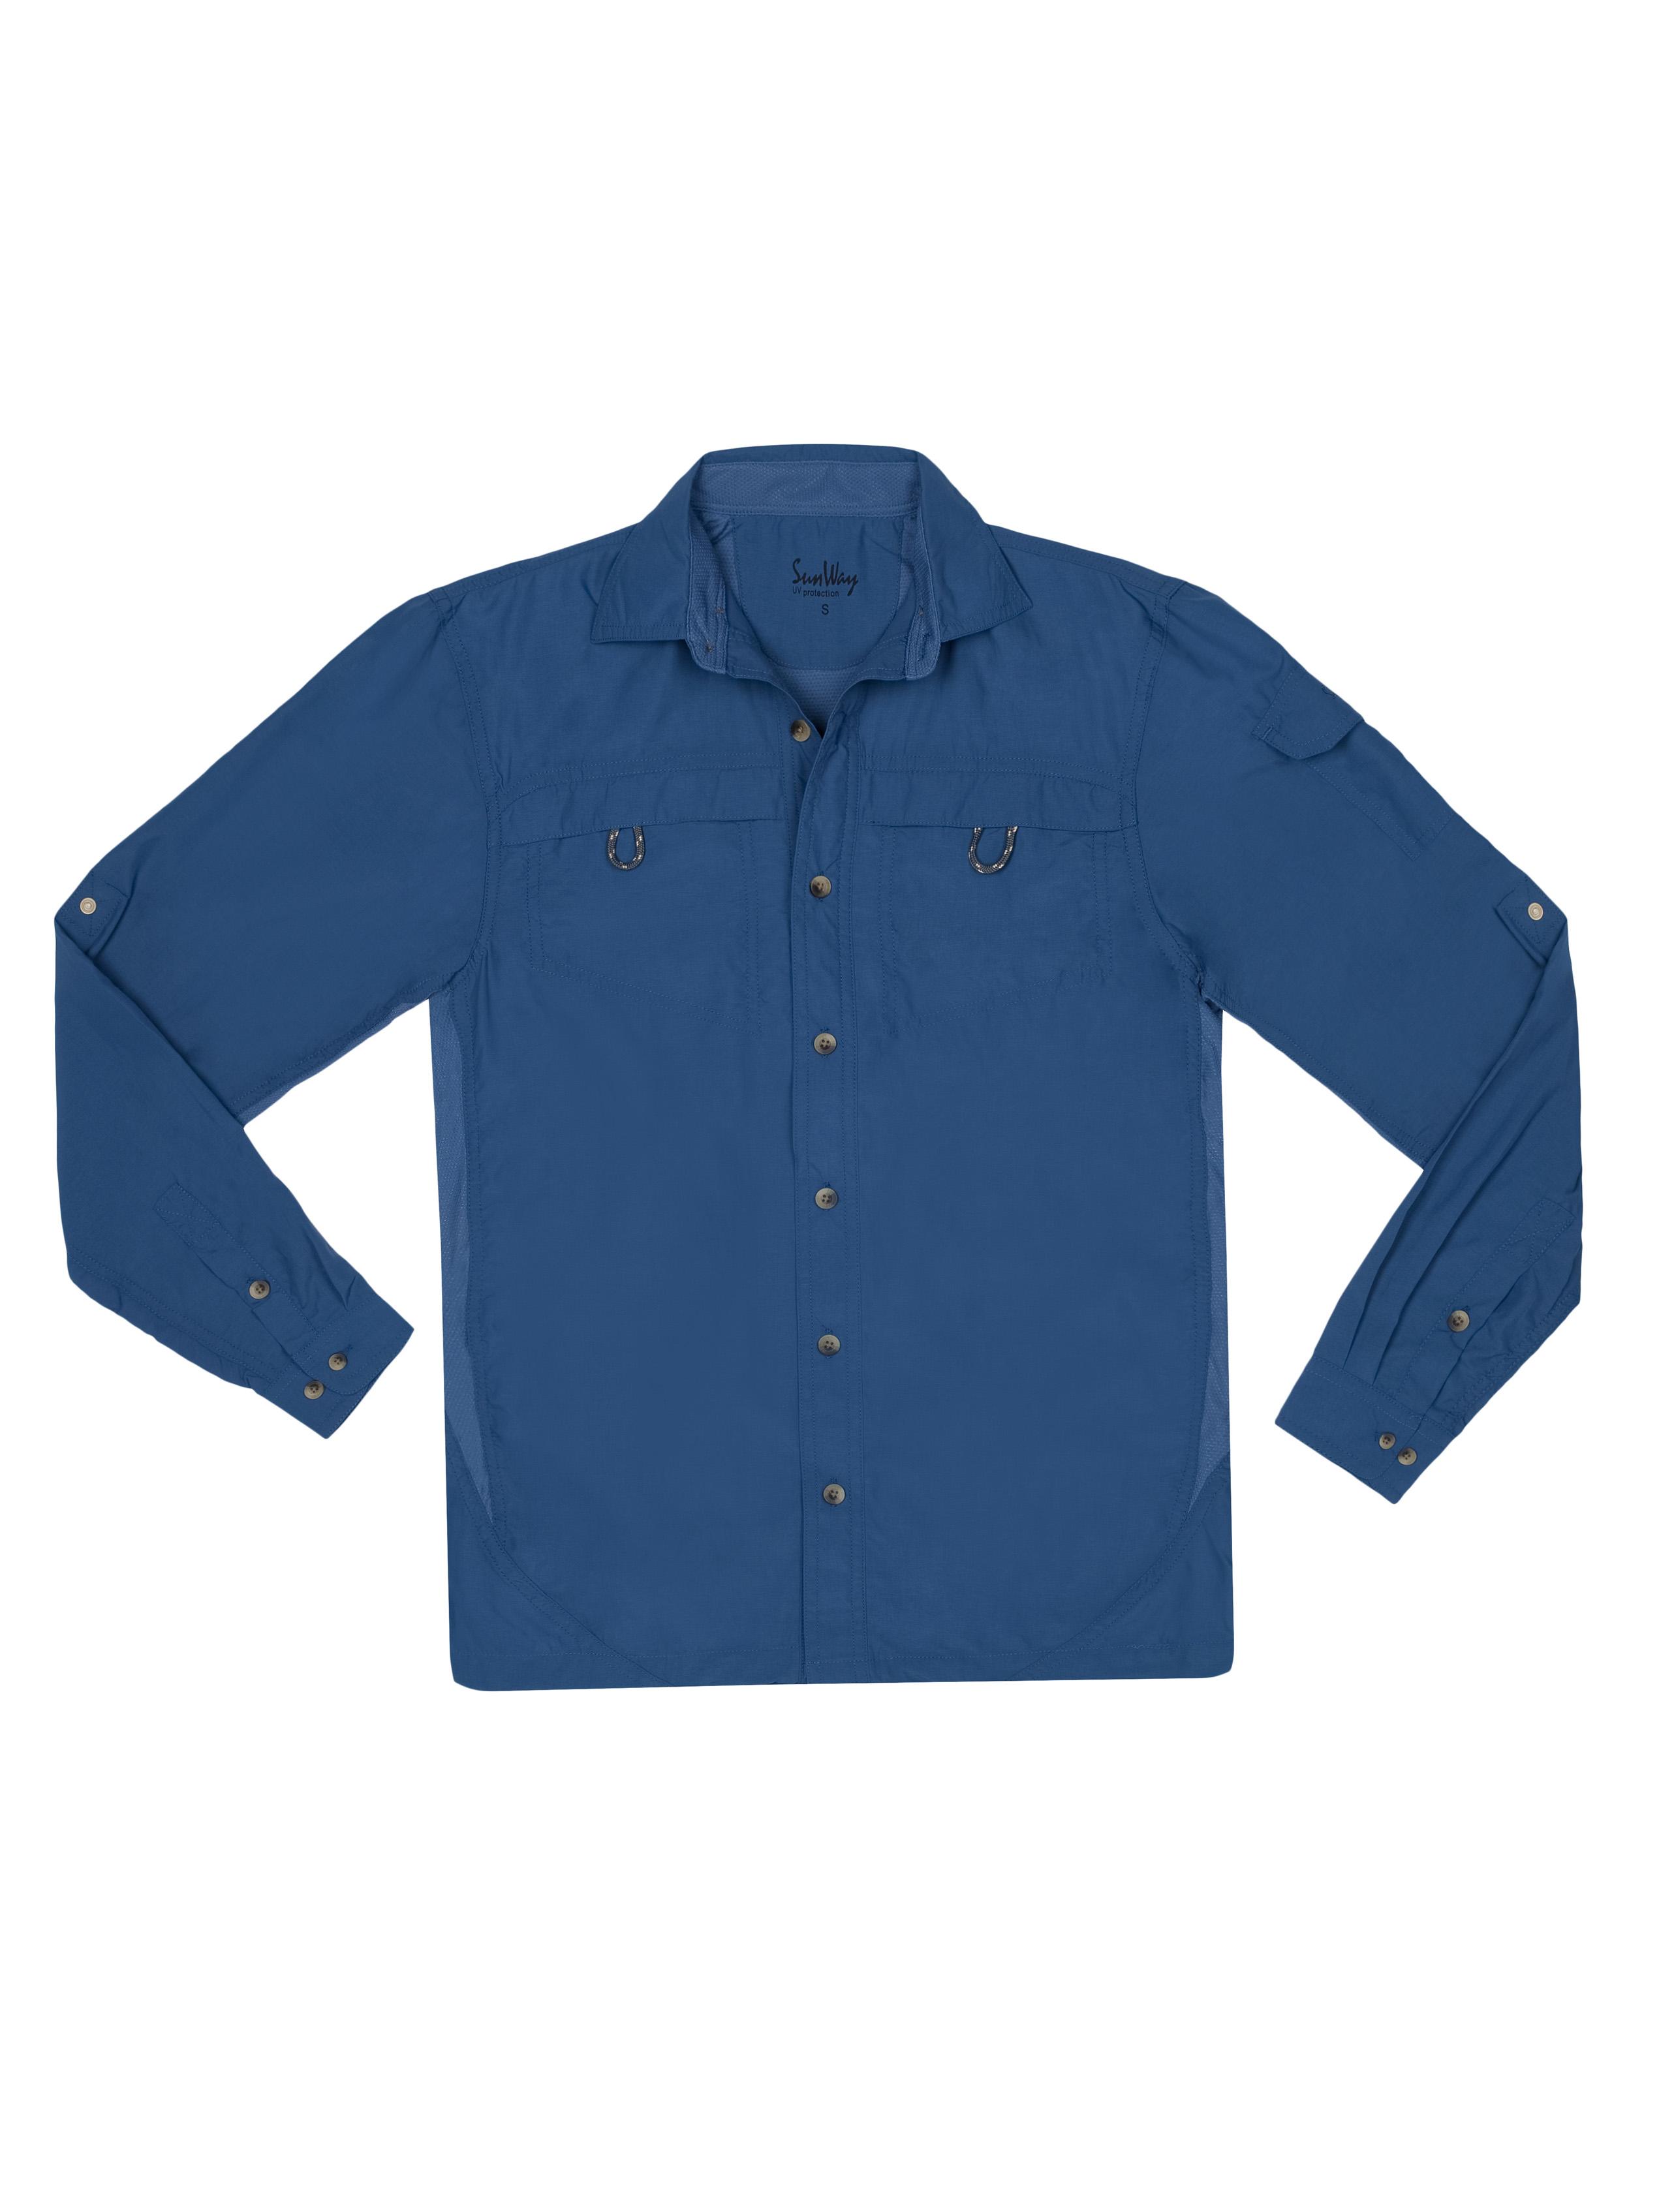 UPF50+ outdoor shirt for men